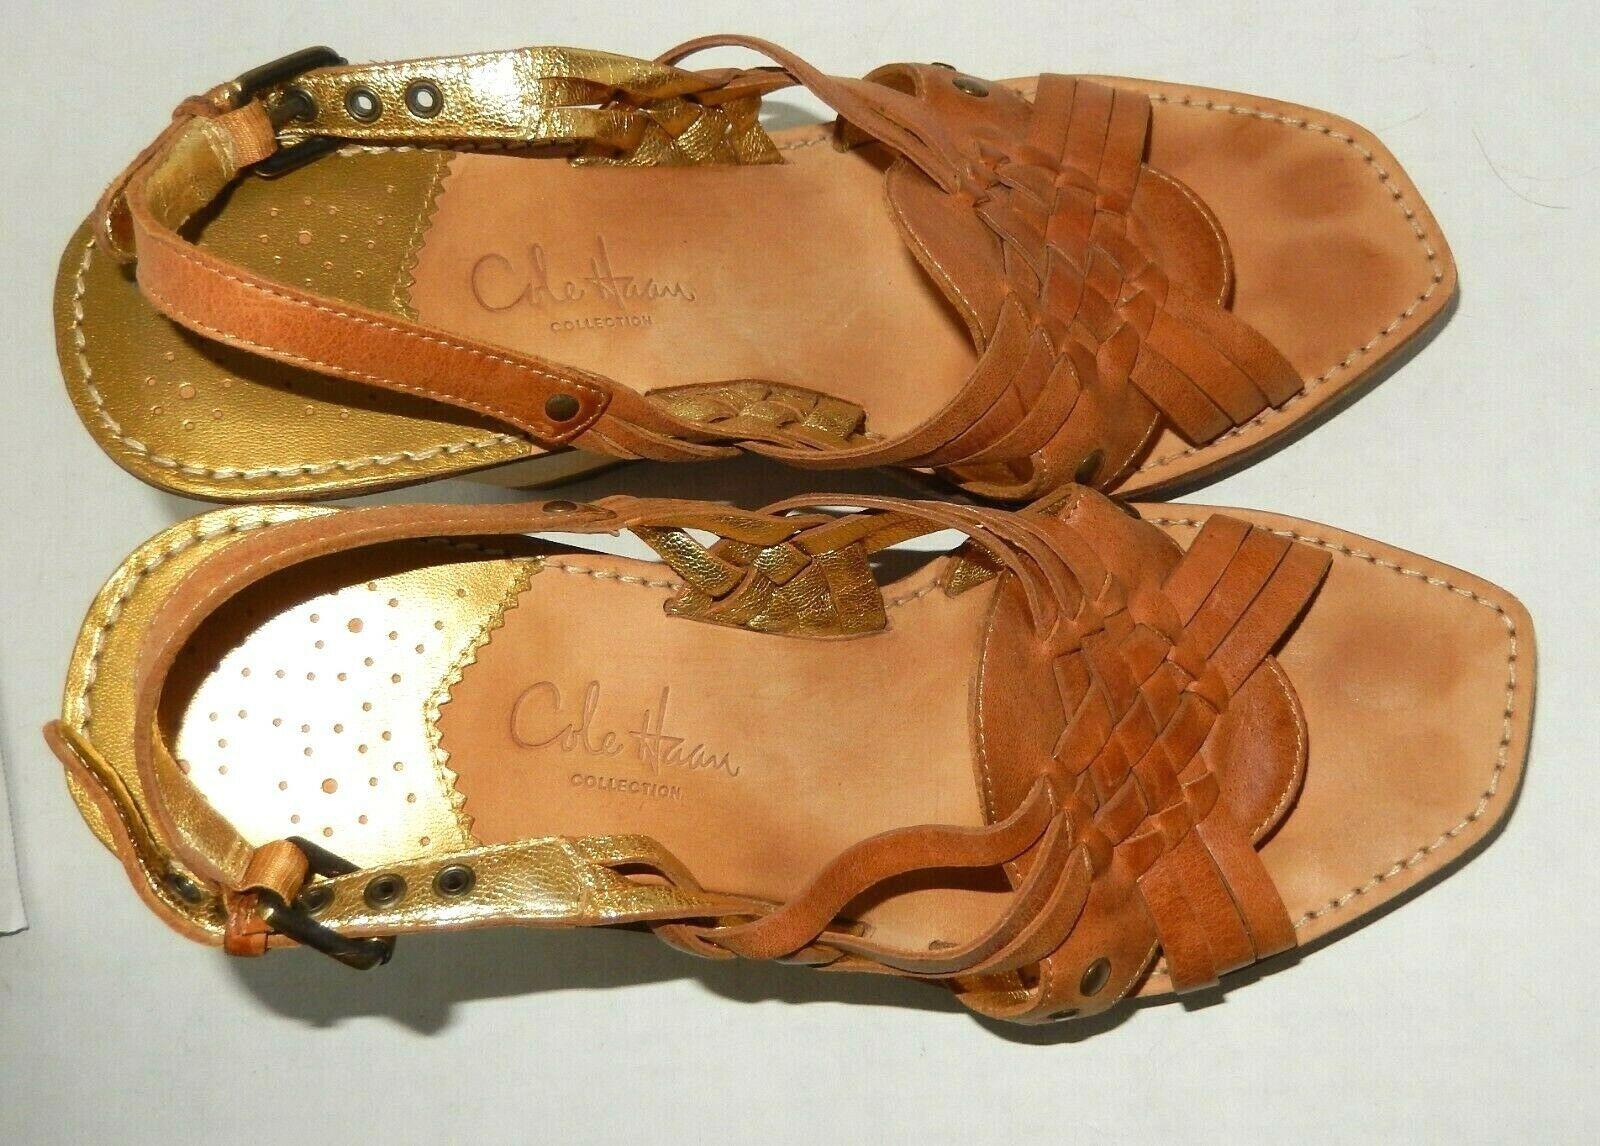 Medium Cole Haan Womens Paley High Wedge Sandstone//Lemon Ice Snake Print Sandal 9.5 B